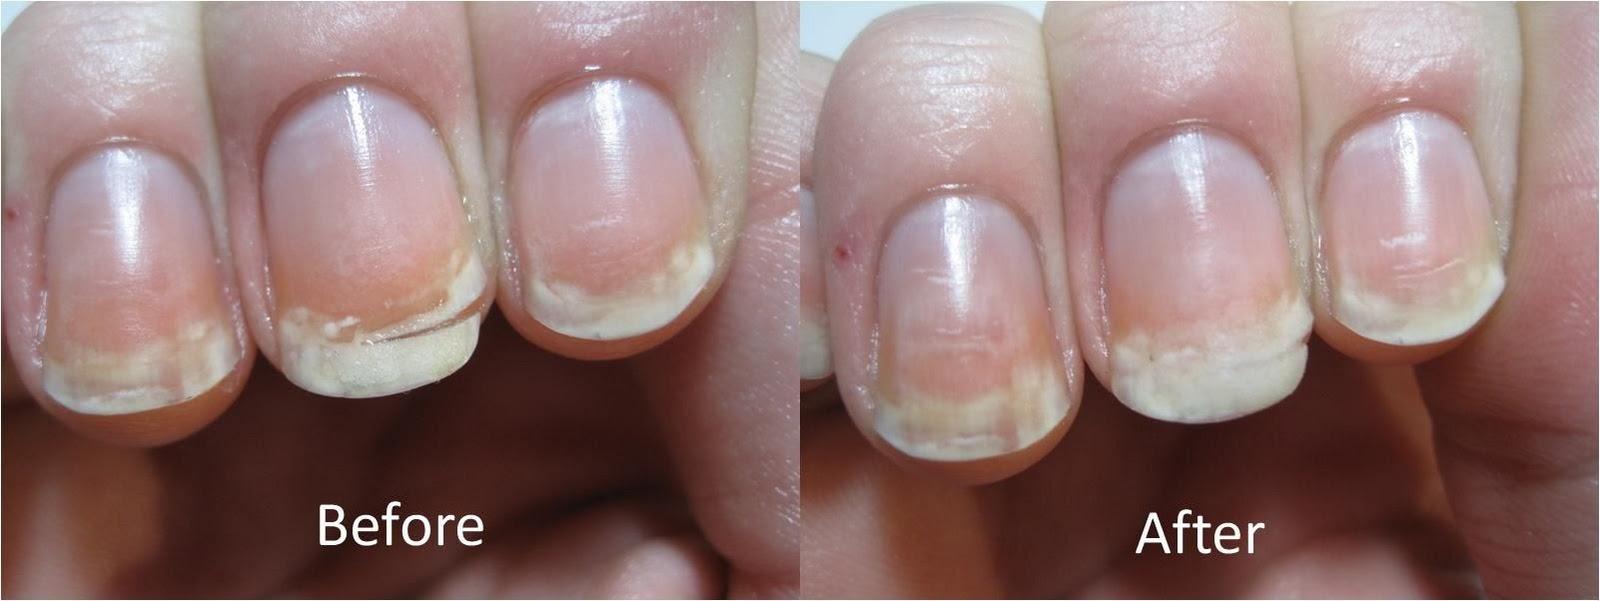 How To Repair Bitten Nails   Best Nail Designs 2018